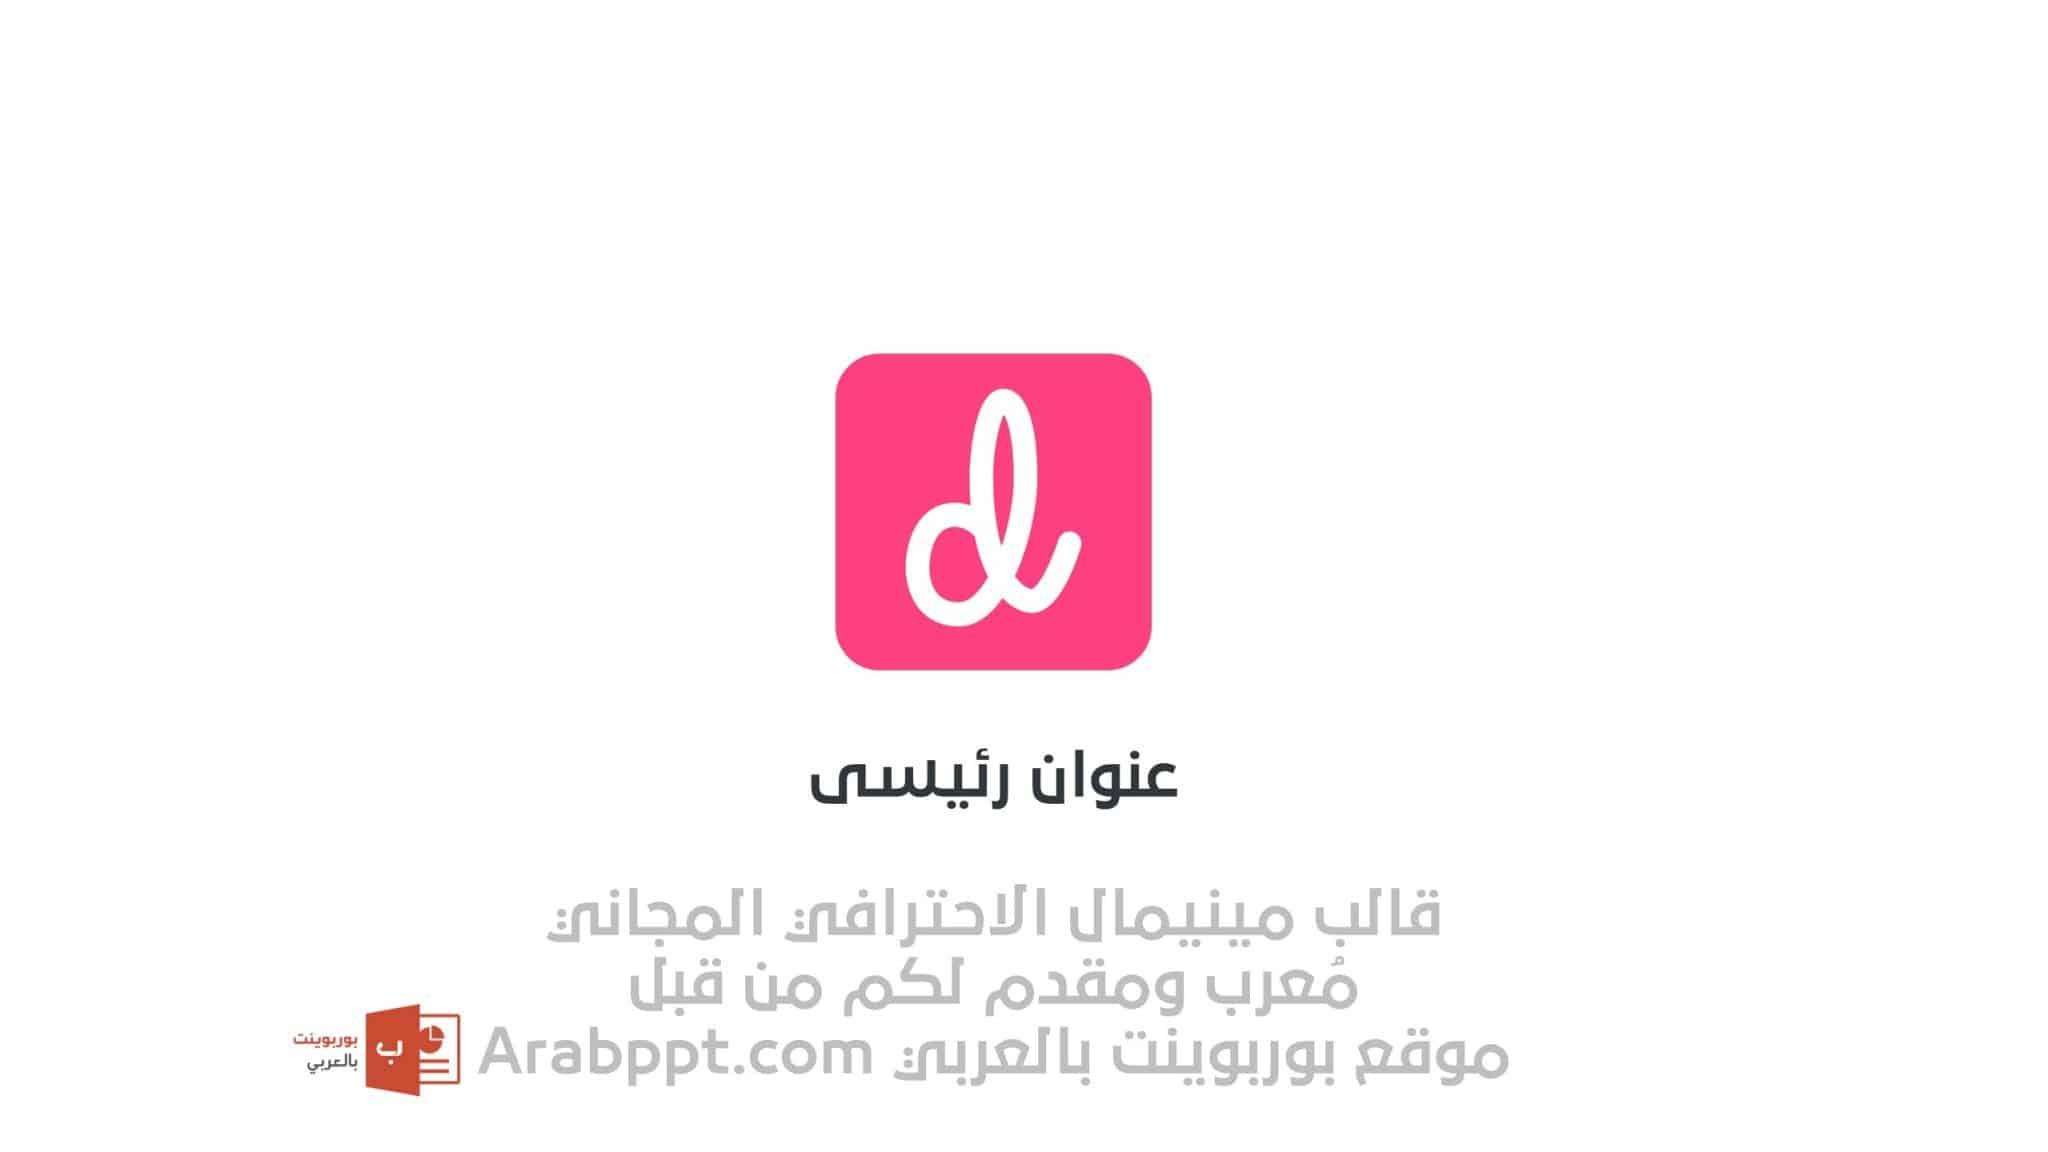 Photo of قالب مينيمال – عرض بوربوينت احترافي ومميز للأعمال بالعربي ومجانا (حصري)